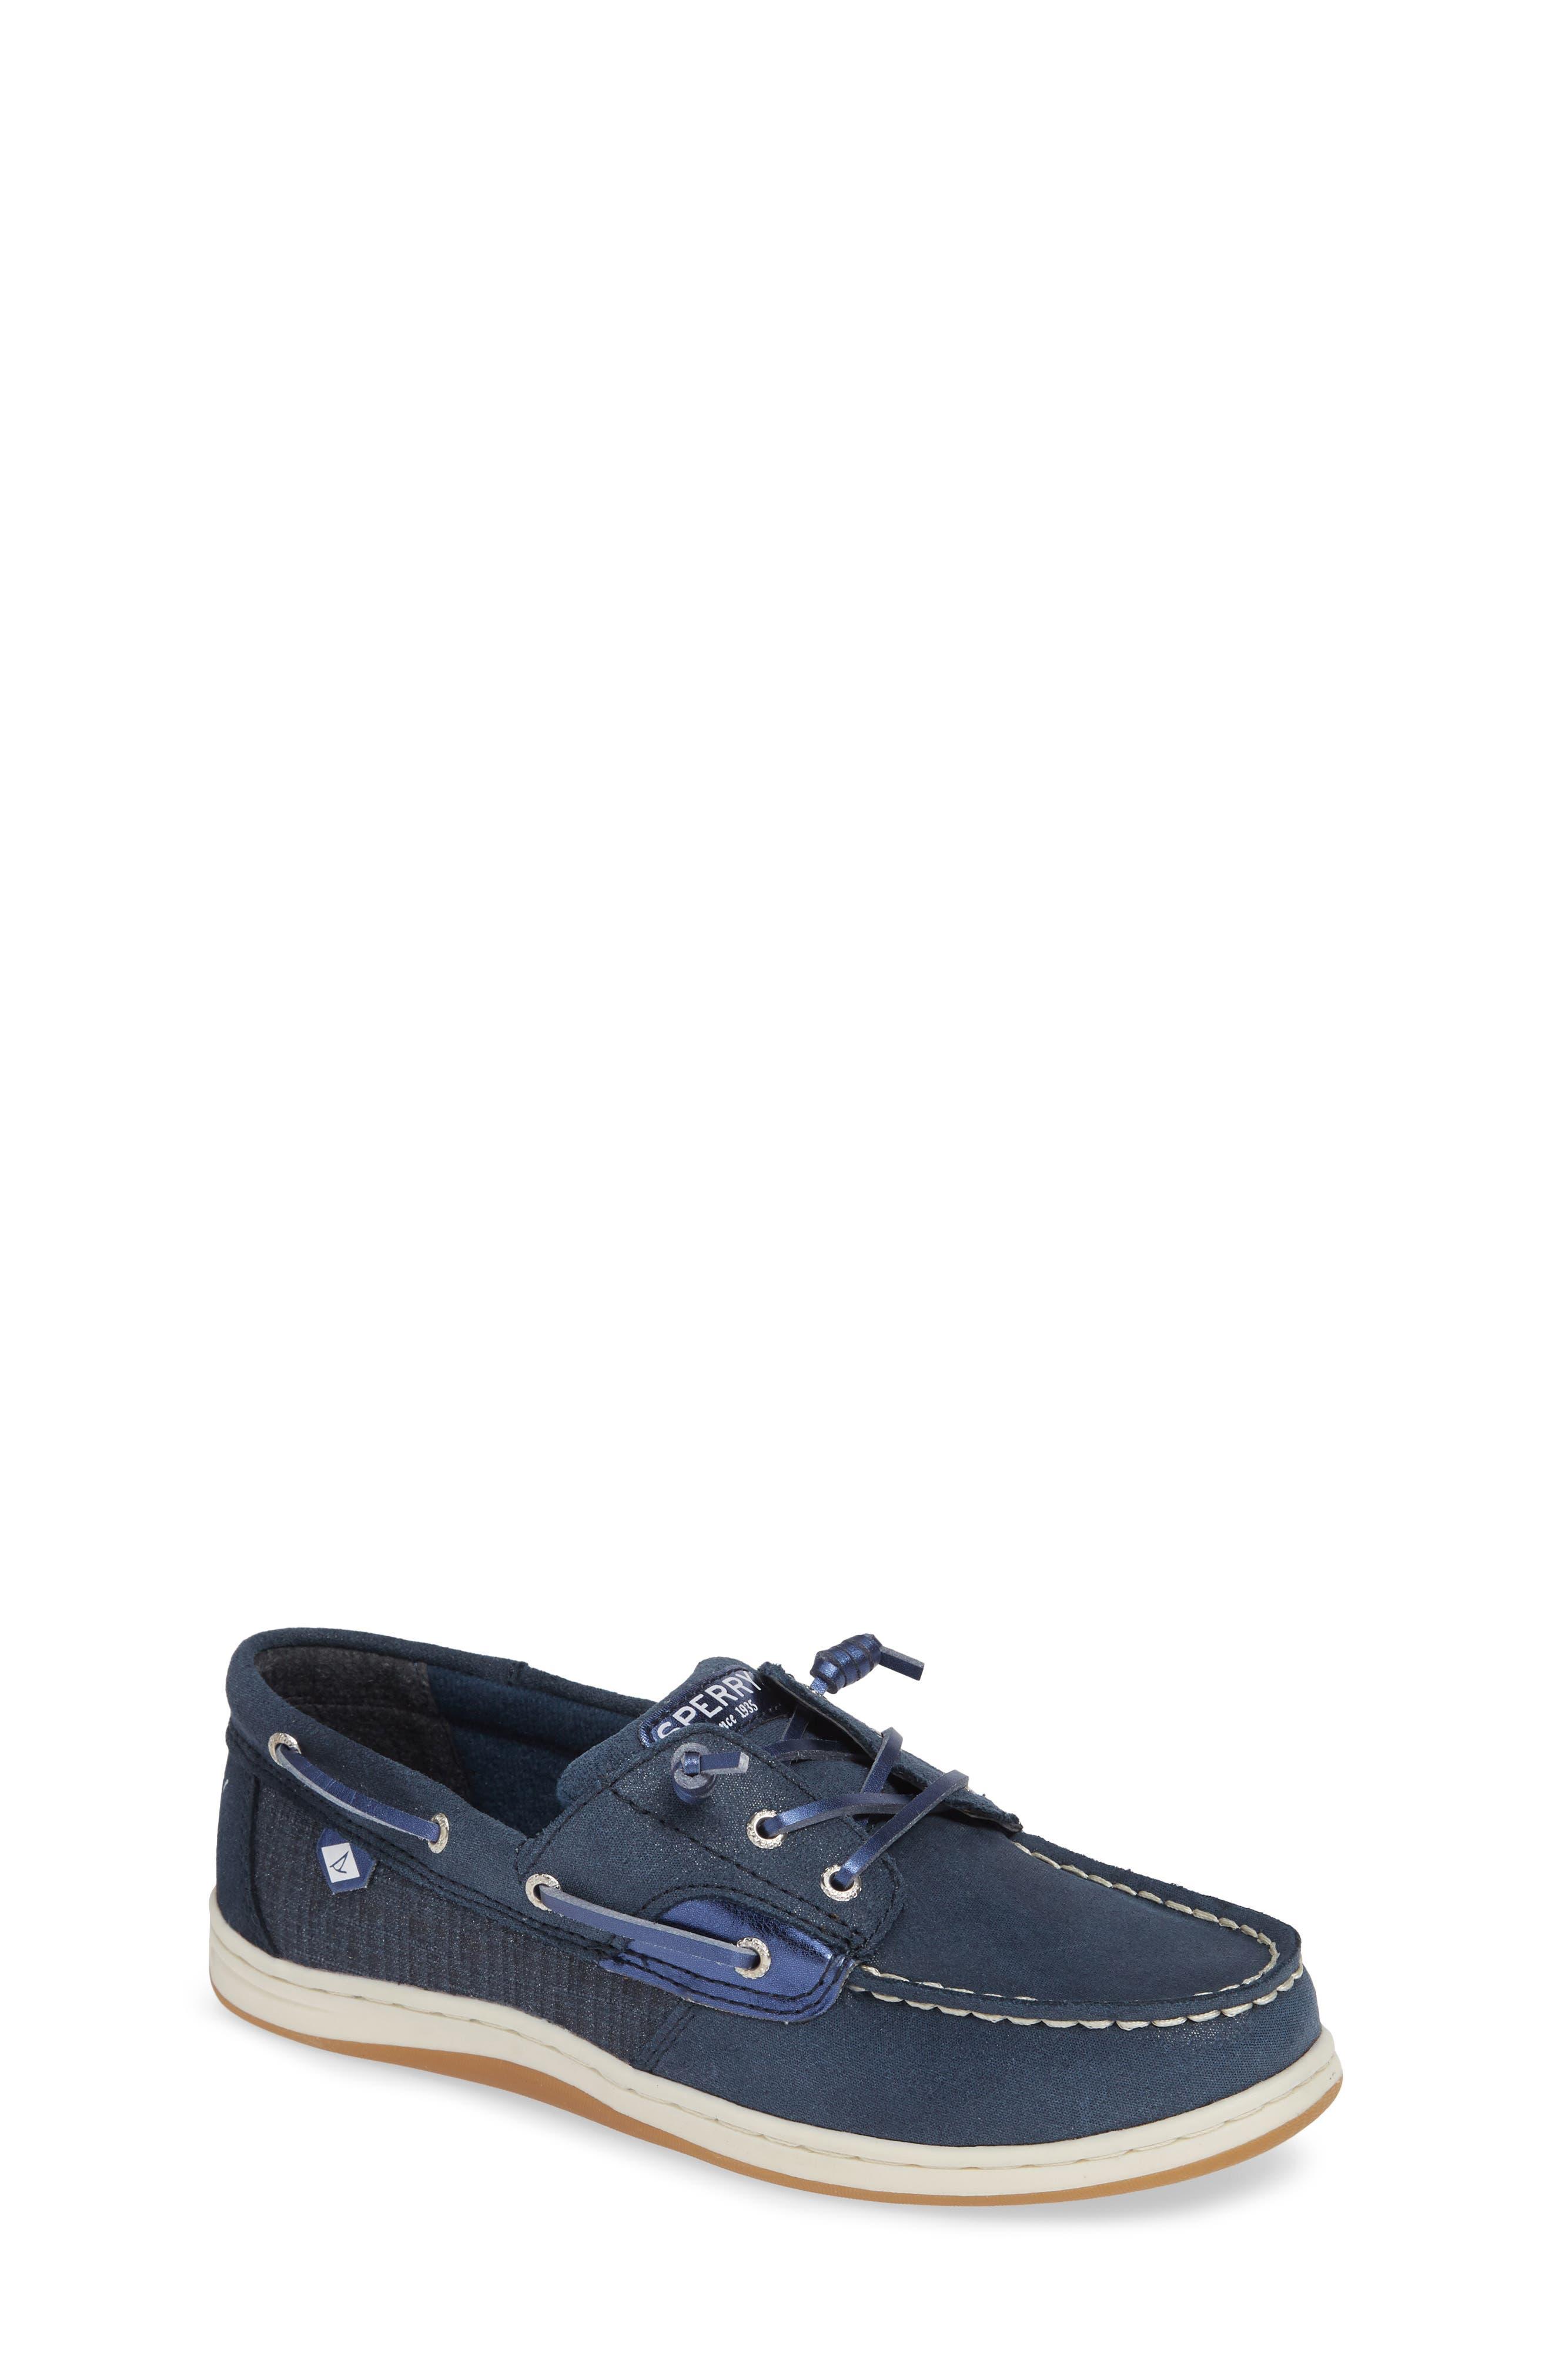 'Songfish Jr' Boat Shoe,                         Main,                         color, 410